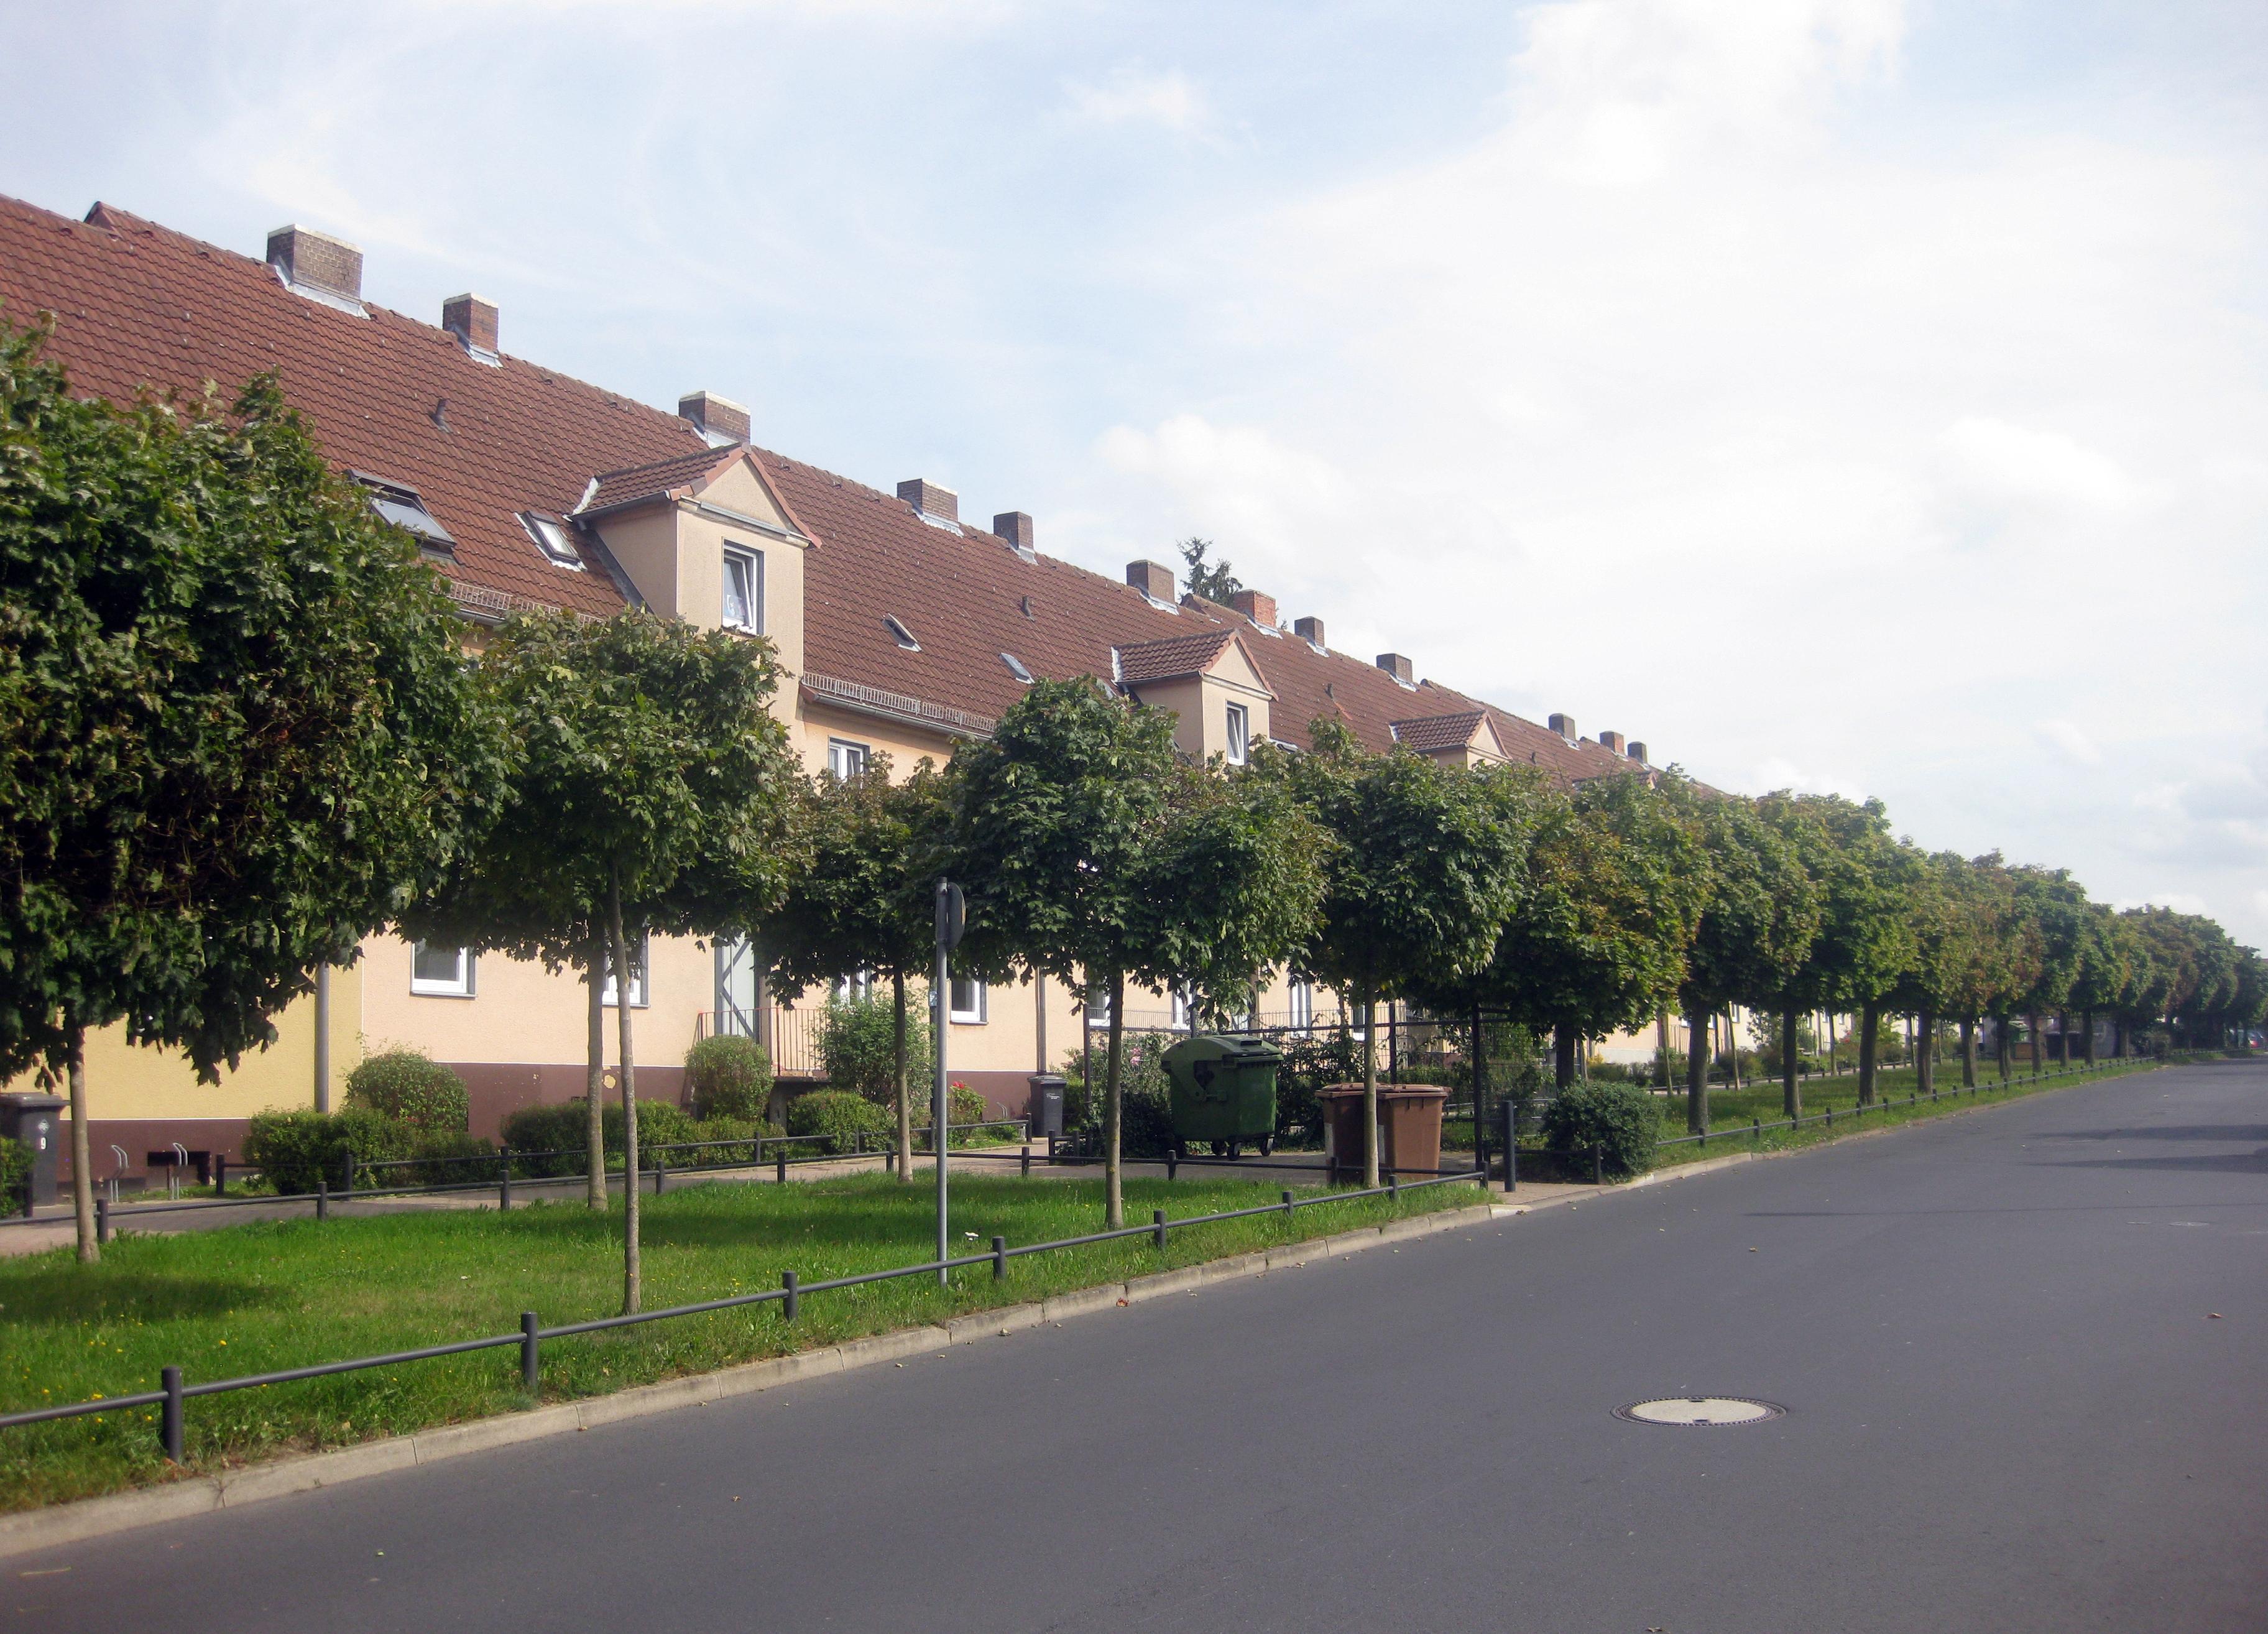 Ladiesfitnessland lohfelden